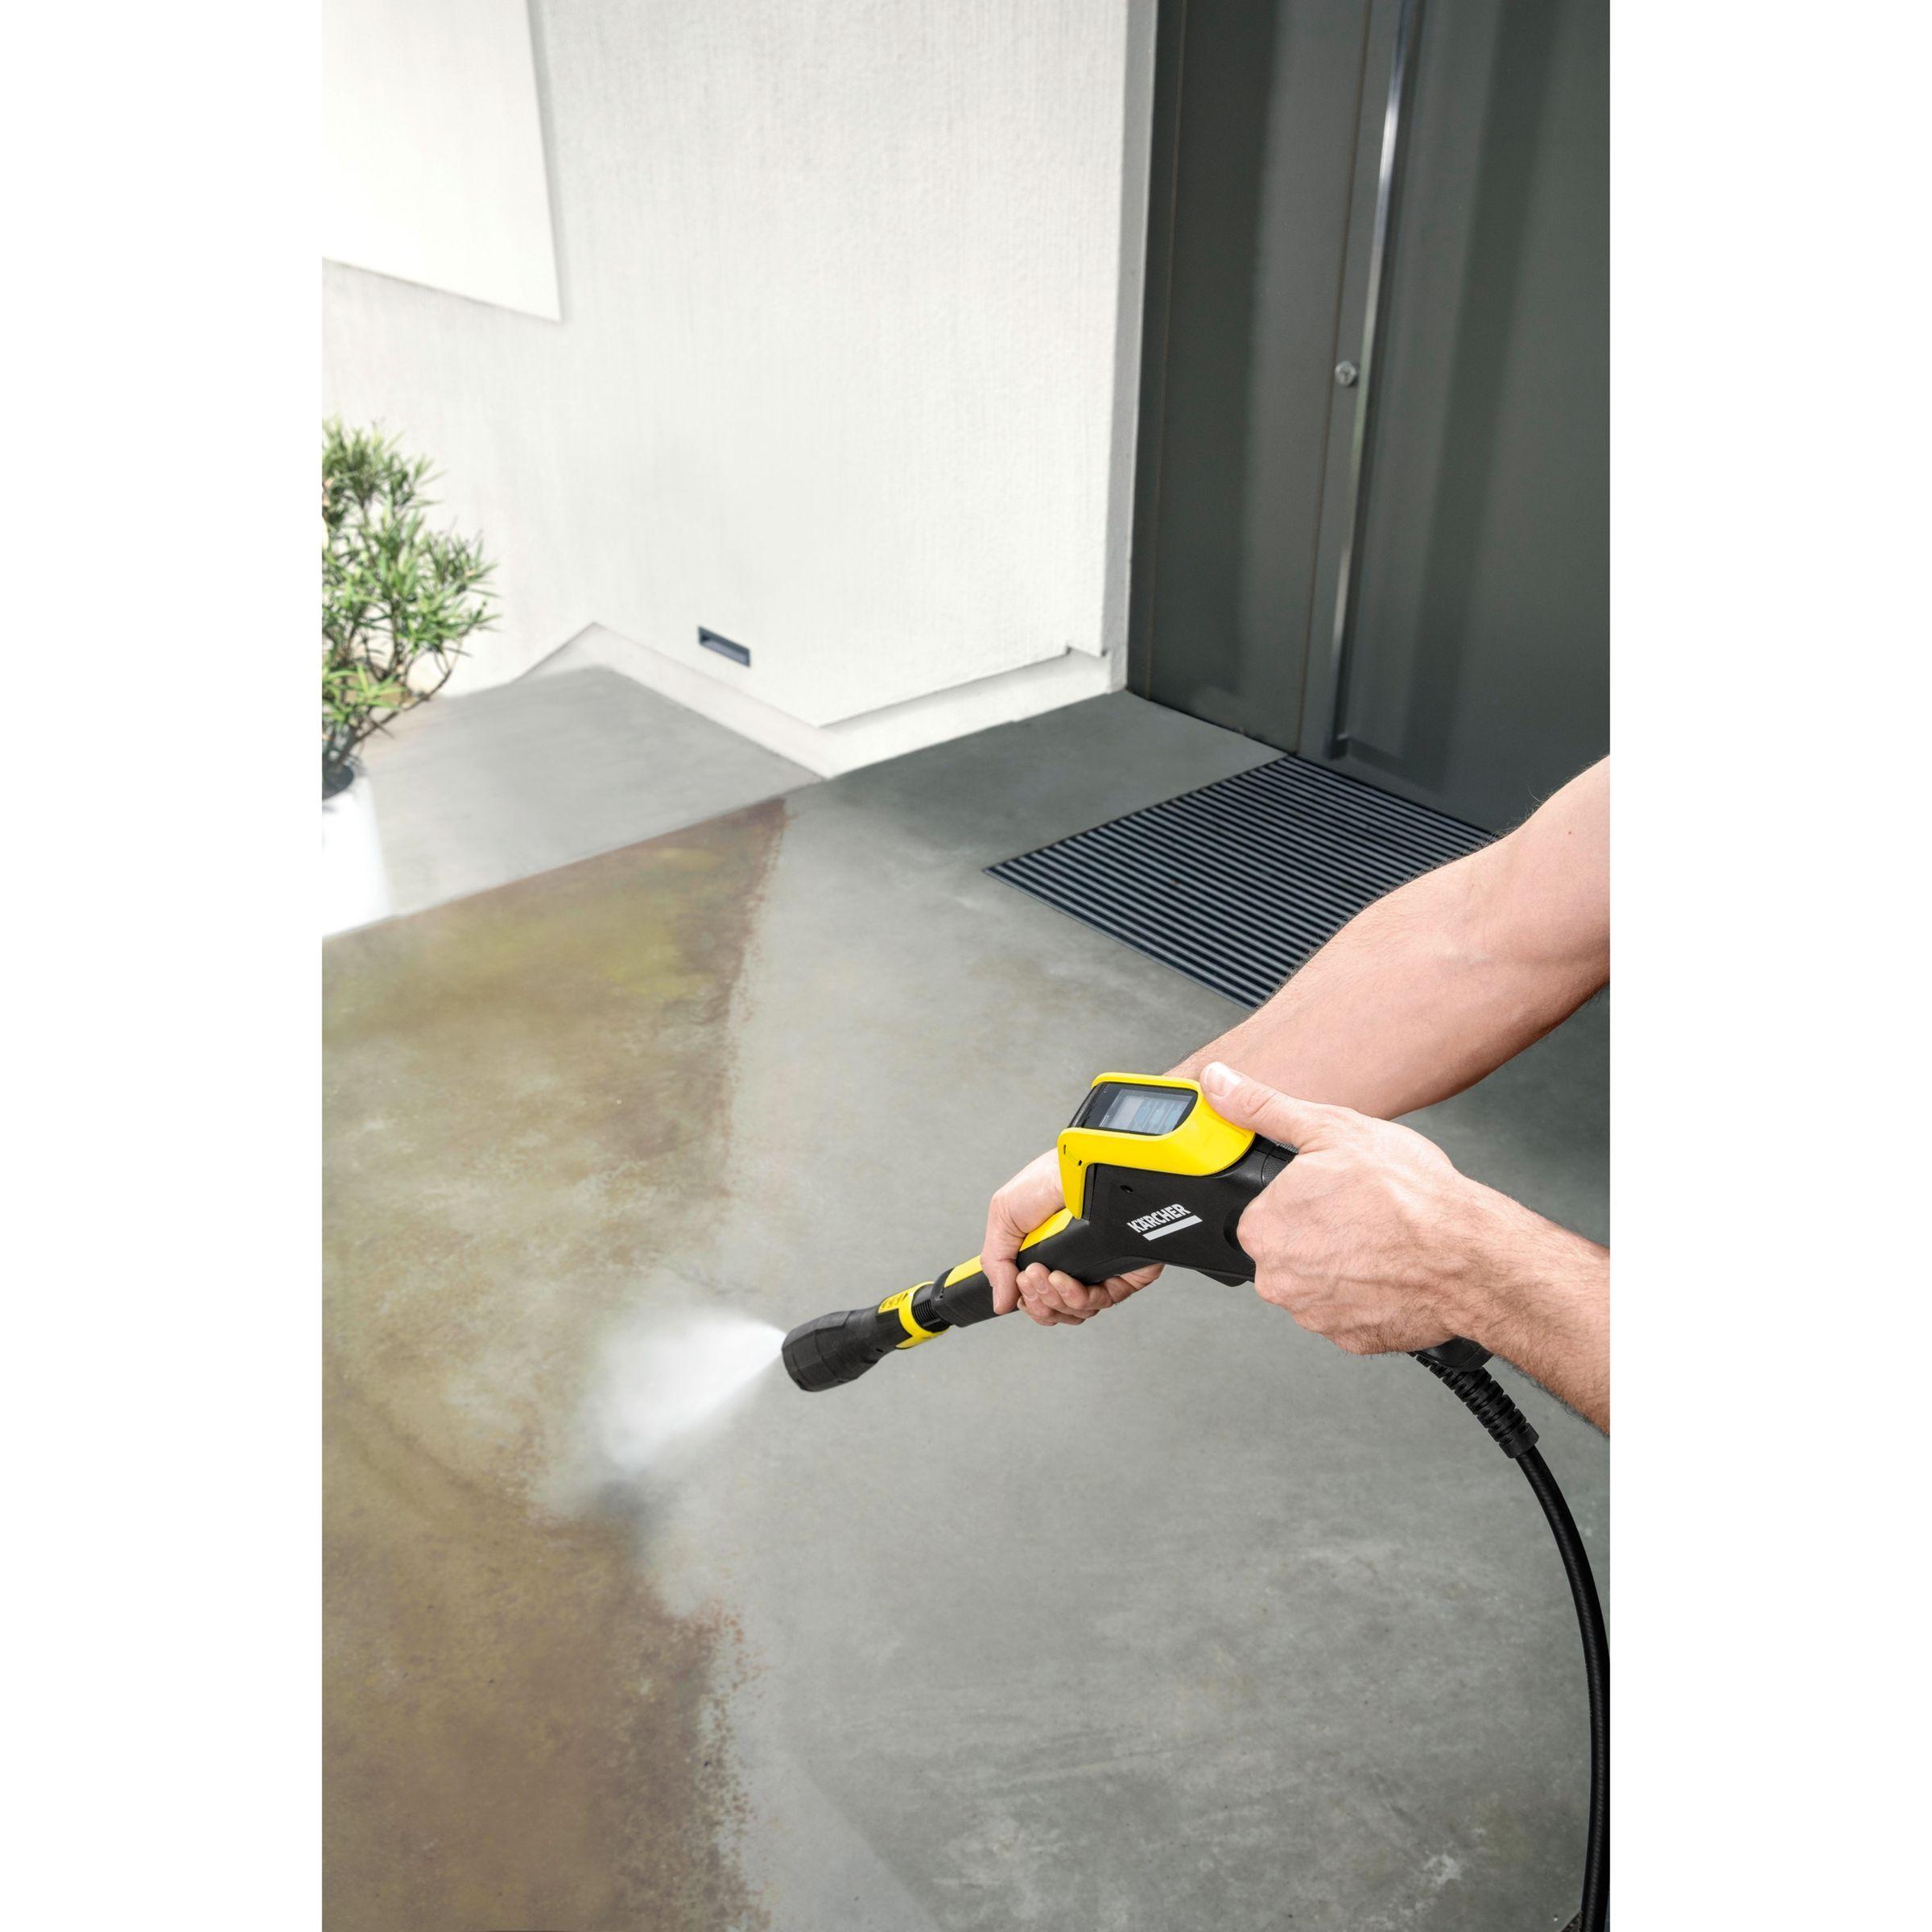 Karcher K7 Premium Full Control Plus Home Pressure Washer Washer Garden Power Tools Pressure Canning